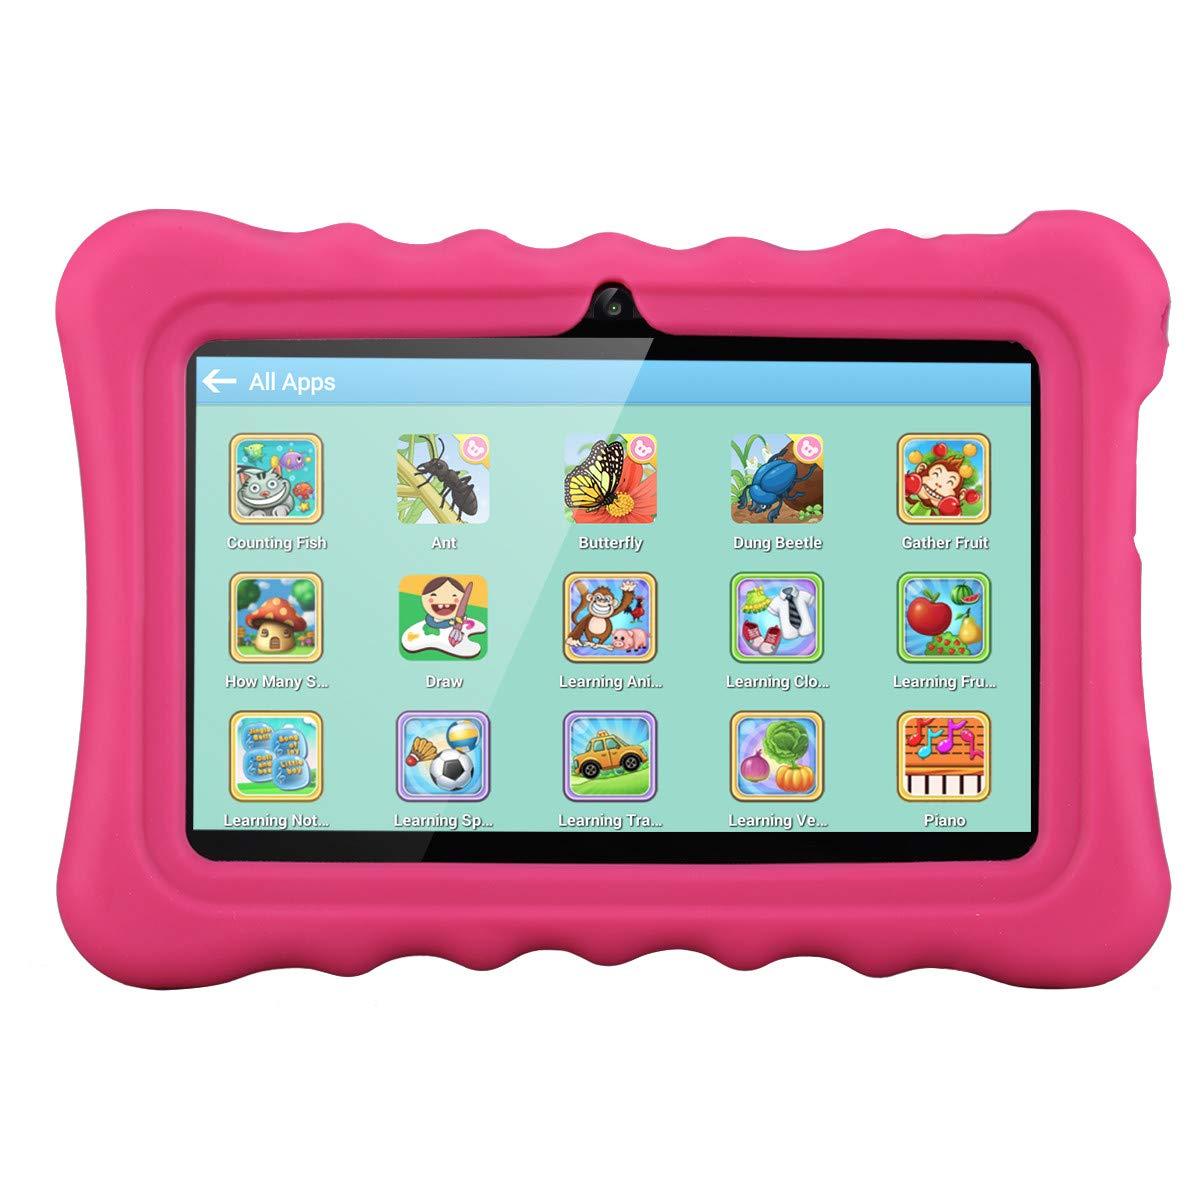 Ainol Q88 Android 7.1 RK3126C Quad Core 1GB+16GB 0.3MP+0.3MP Cam WiFi 2800Ah Tablet PC--Pink by Ainol Q88 (Image #6)